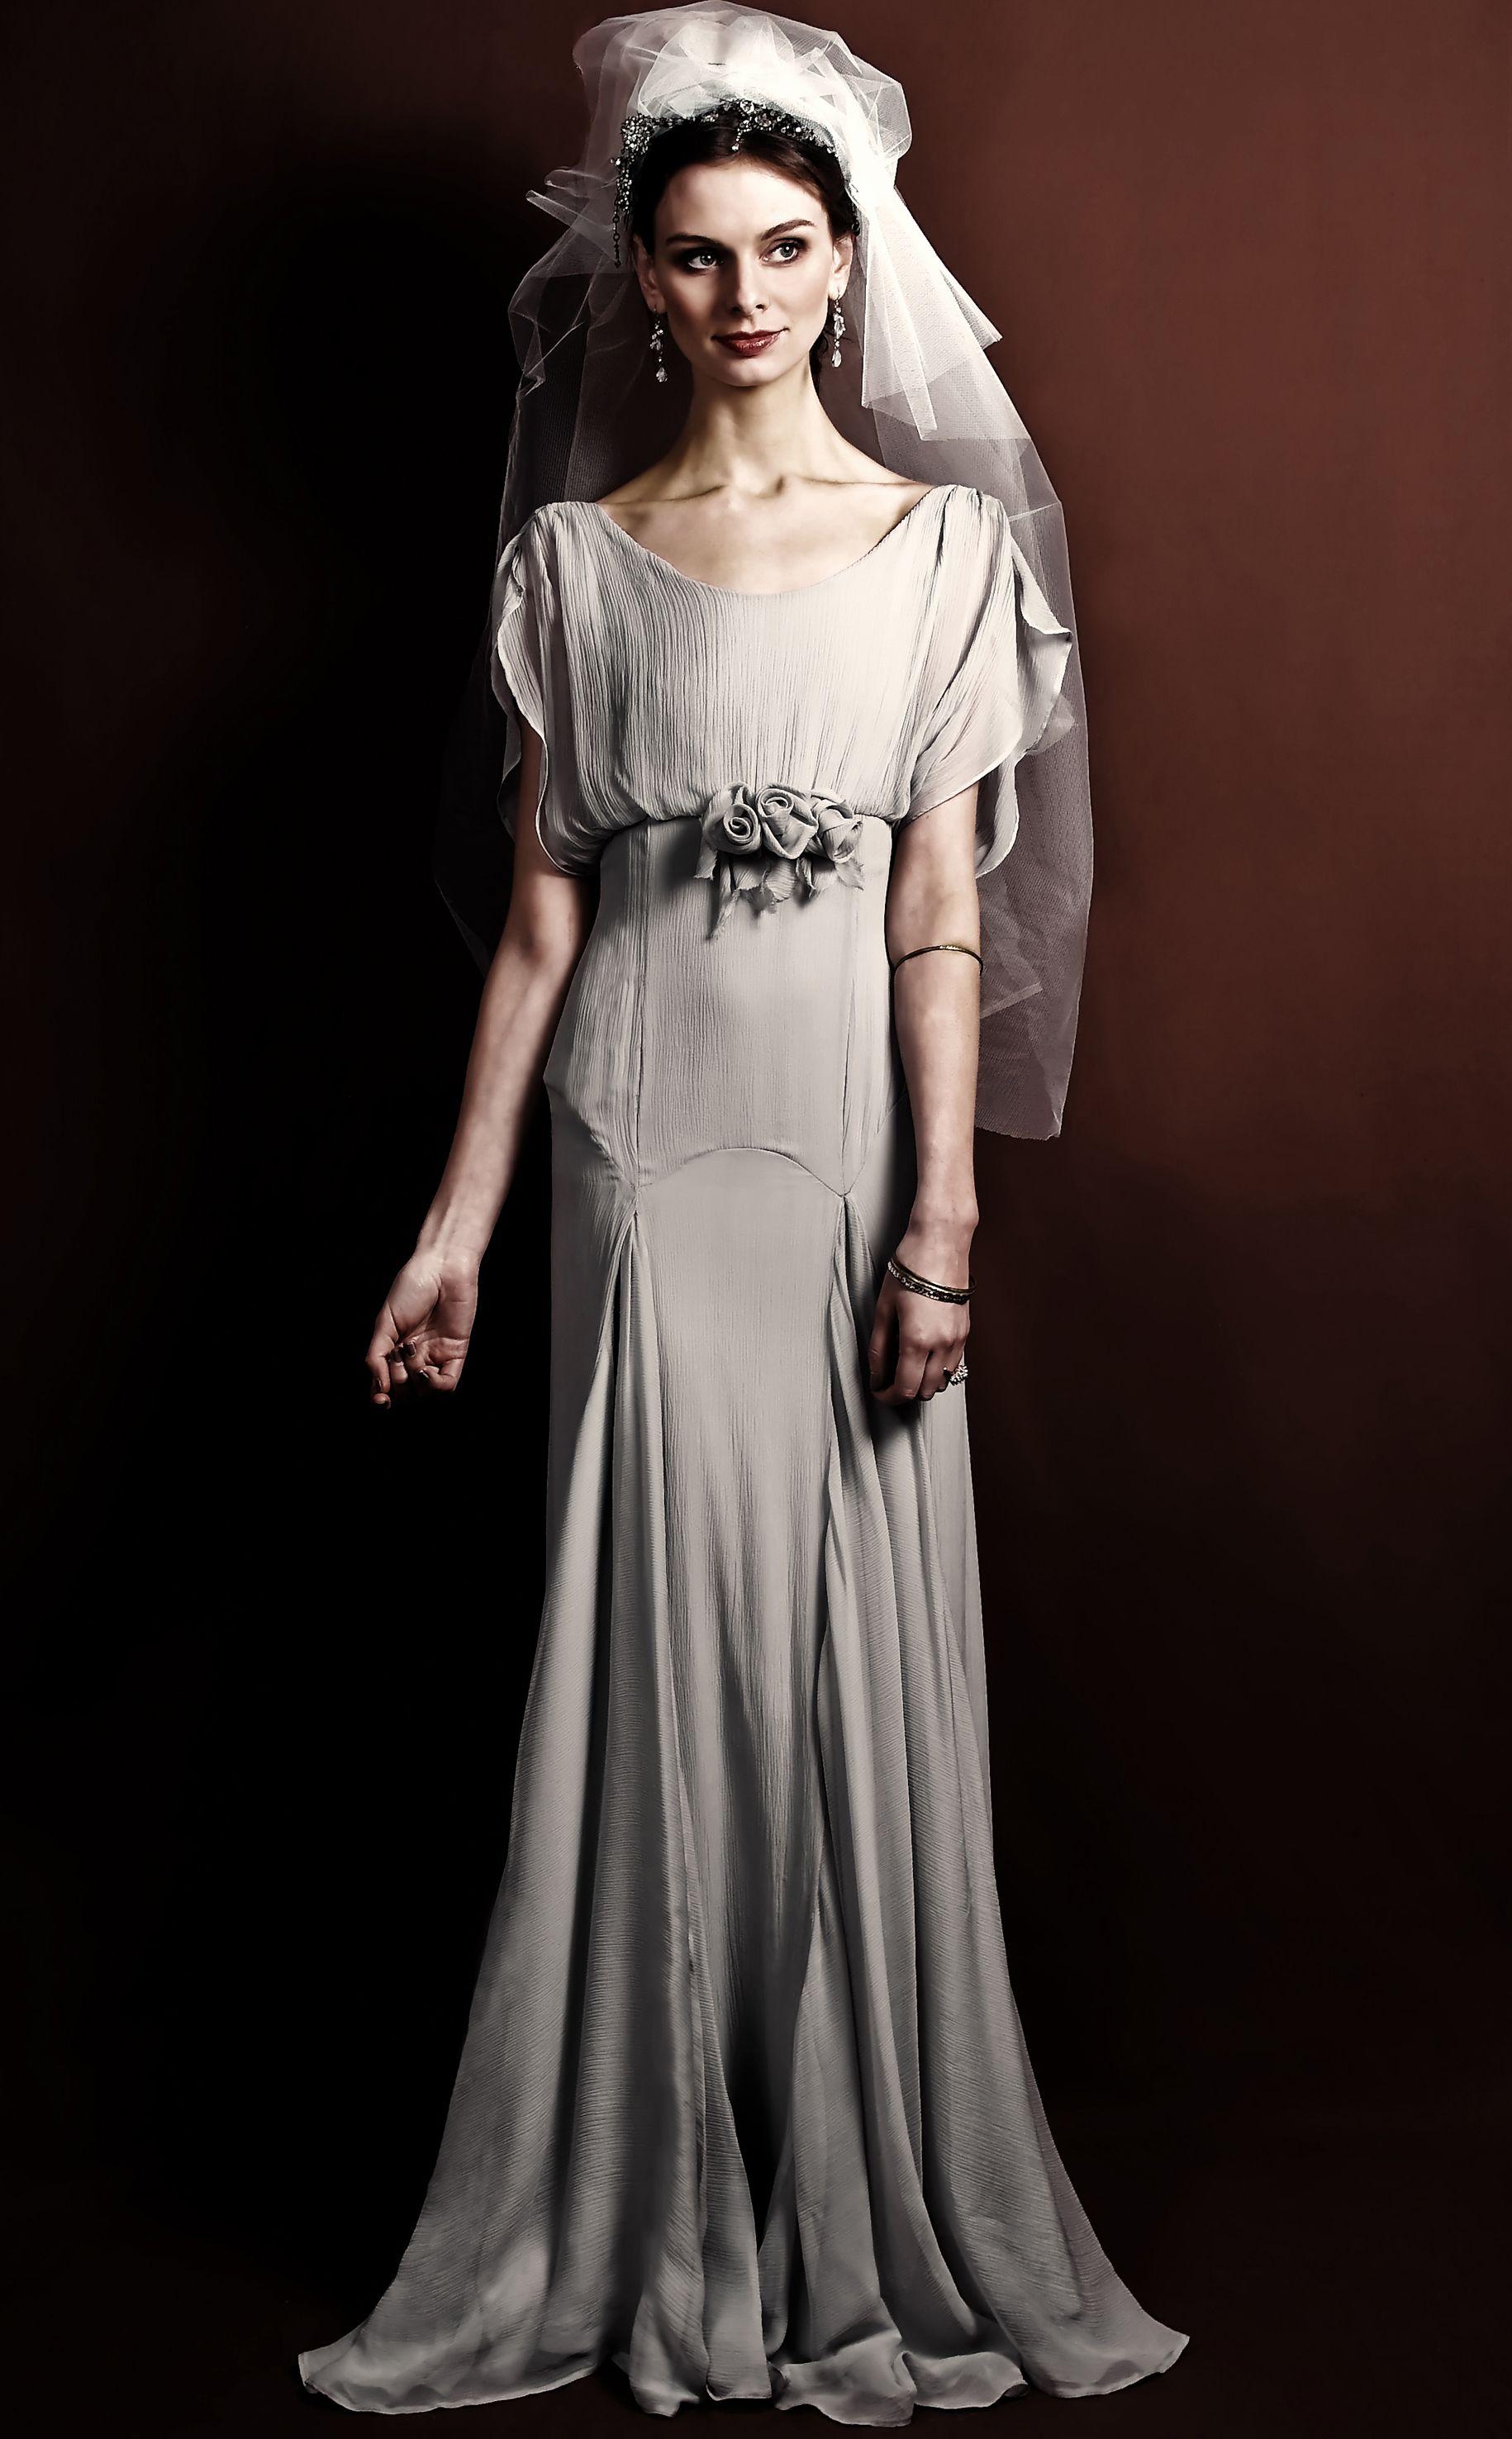 belle wwwbelleandbunty.co.uk Modest wedding dresses